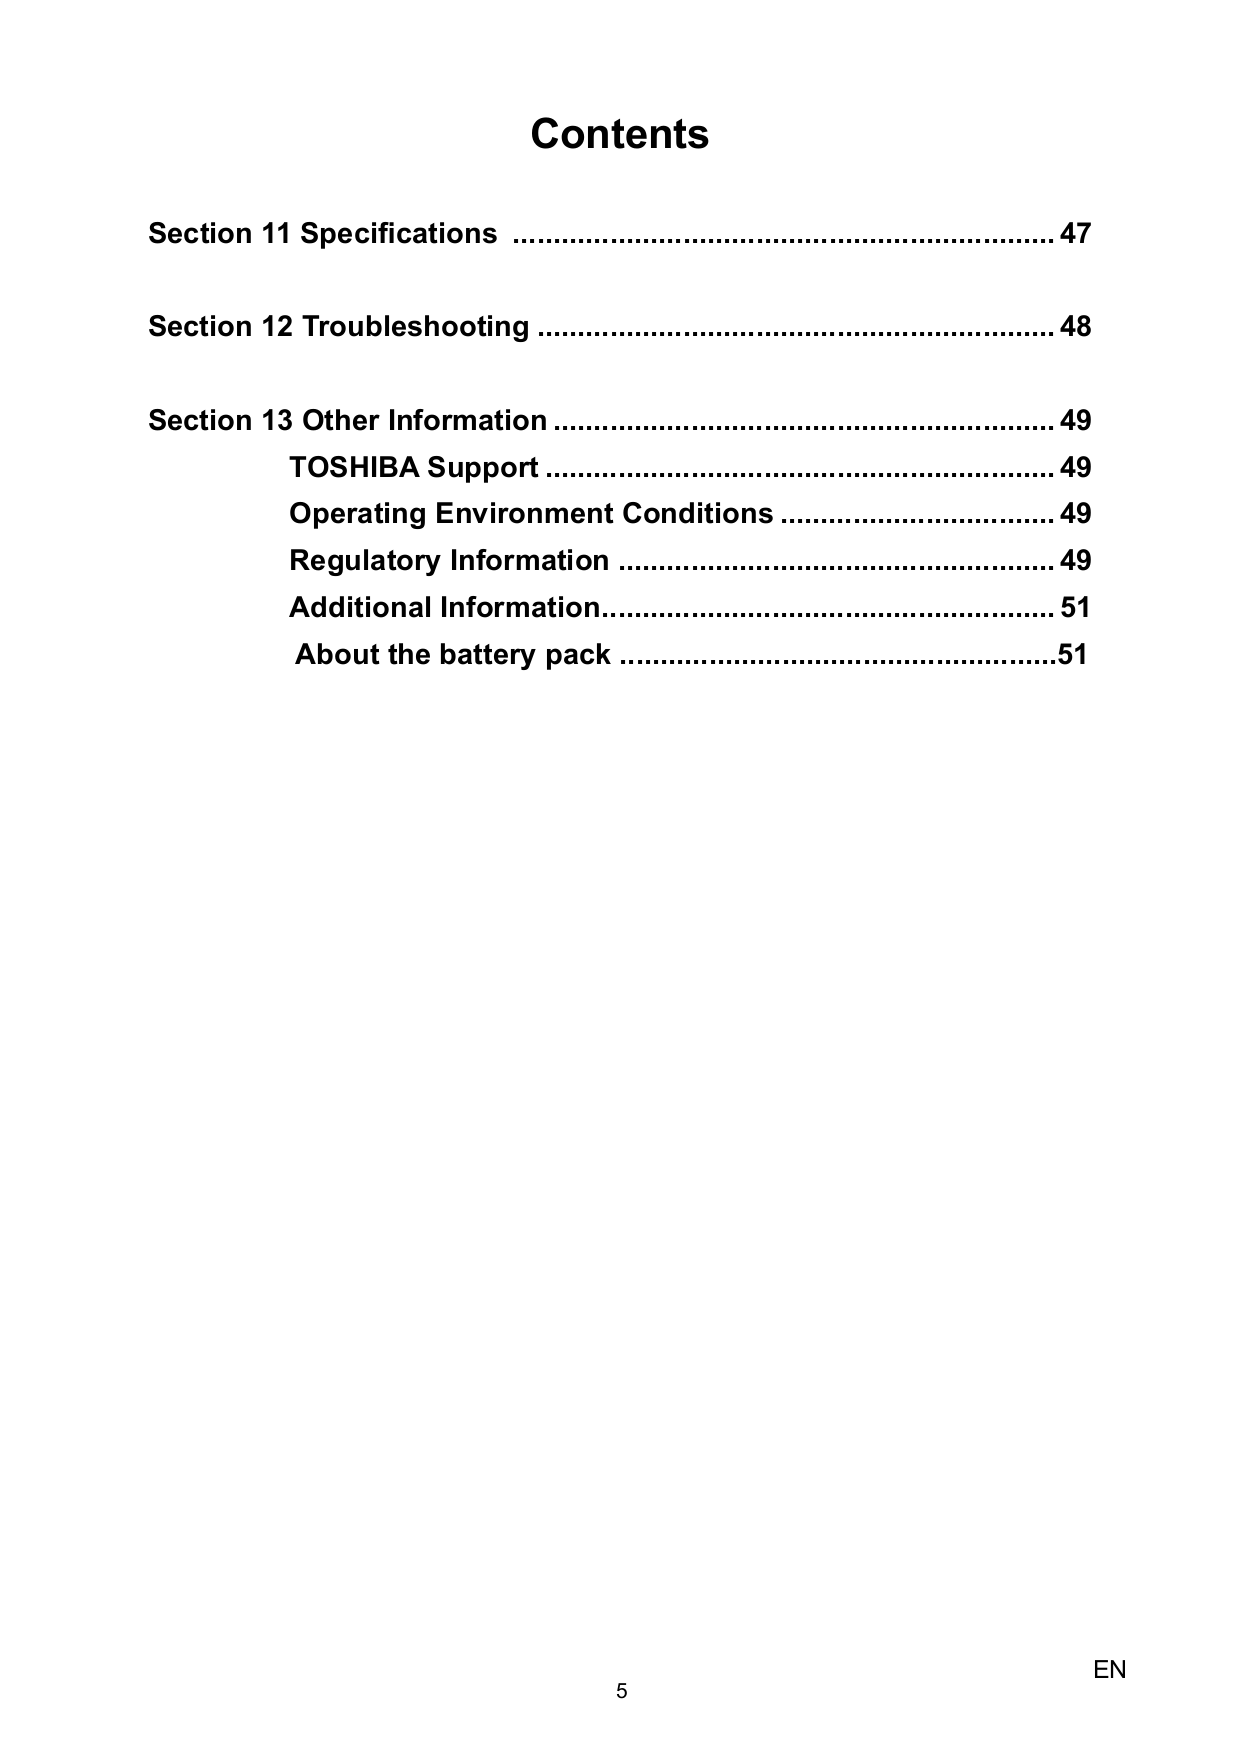 pdf manual for toshiba camcorders camileo h30 rh umlib com User Manual Guide Toshiba Camileo H30 Review